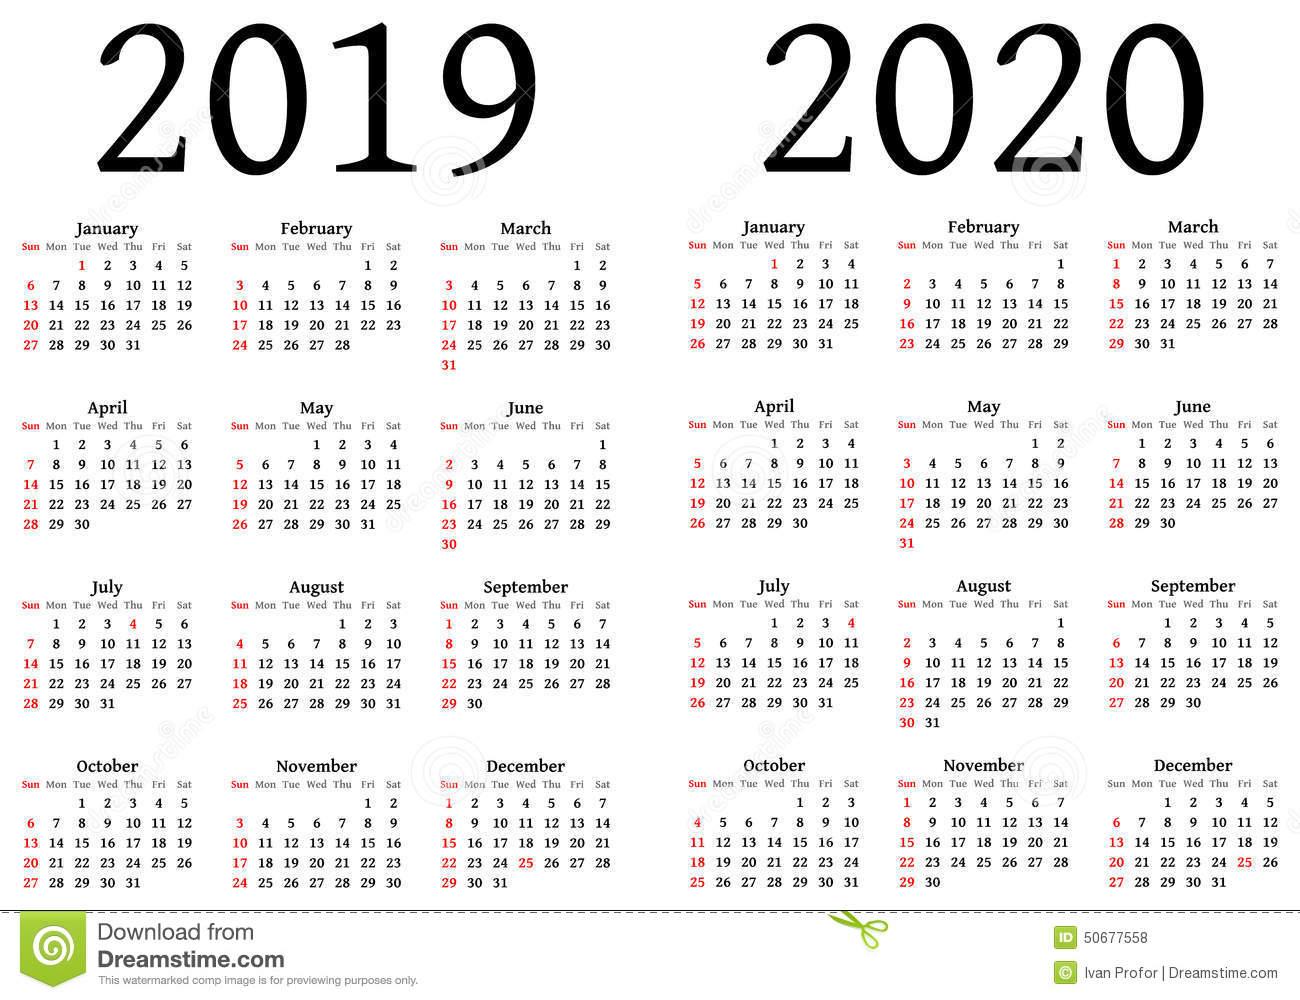 Printable Calendar For 2019 And 2020 | Printable Calendar 2019 with regard to Pocket Printable 2019-2020 Calendar Free